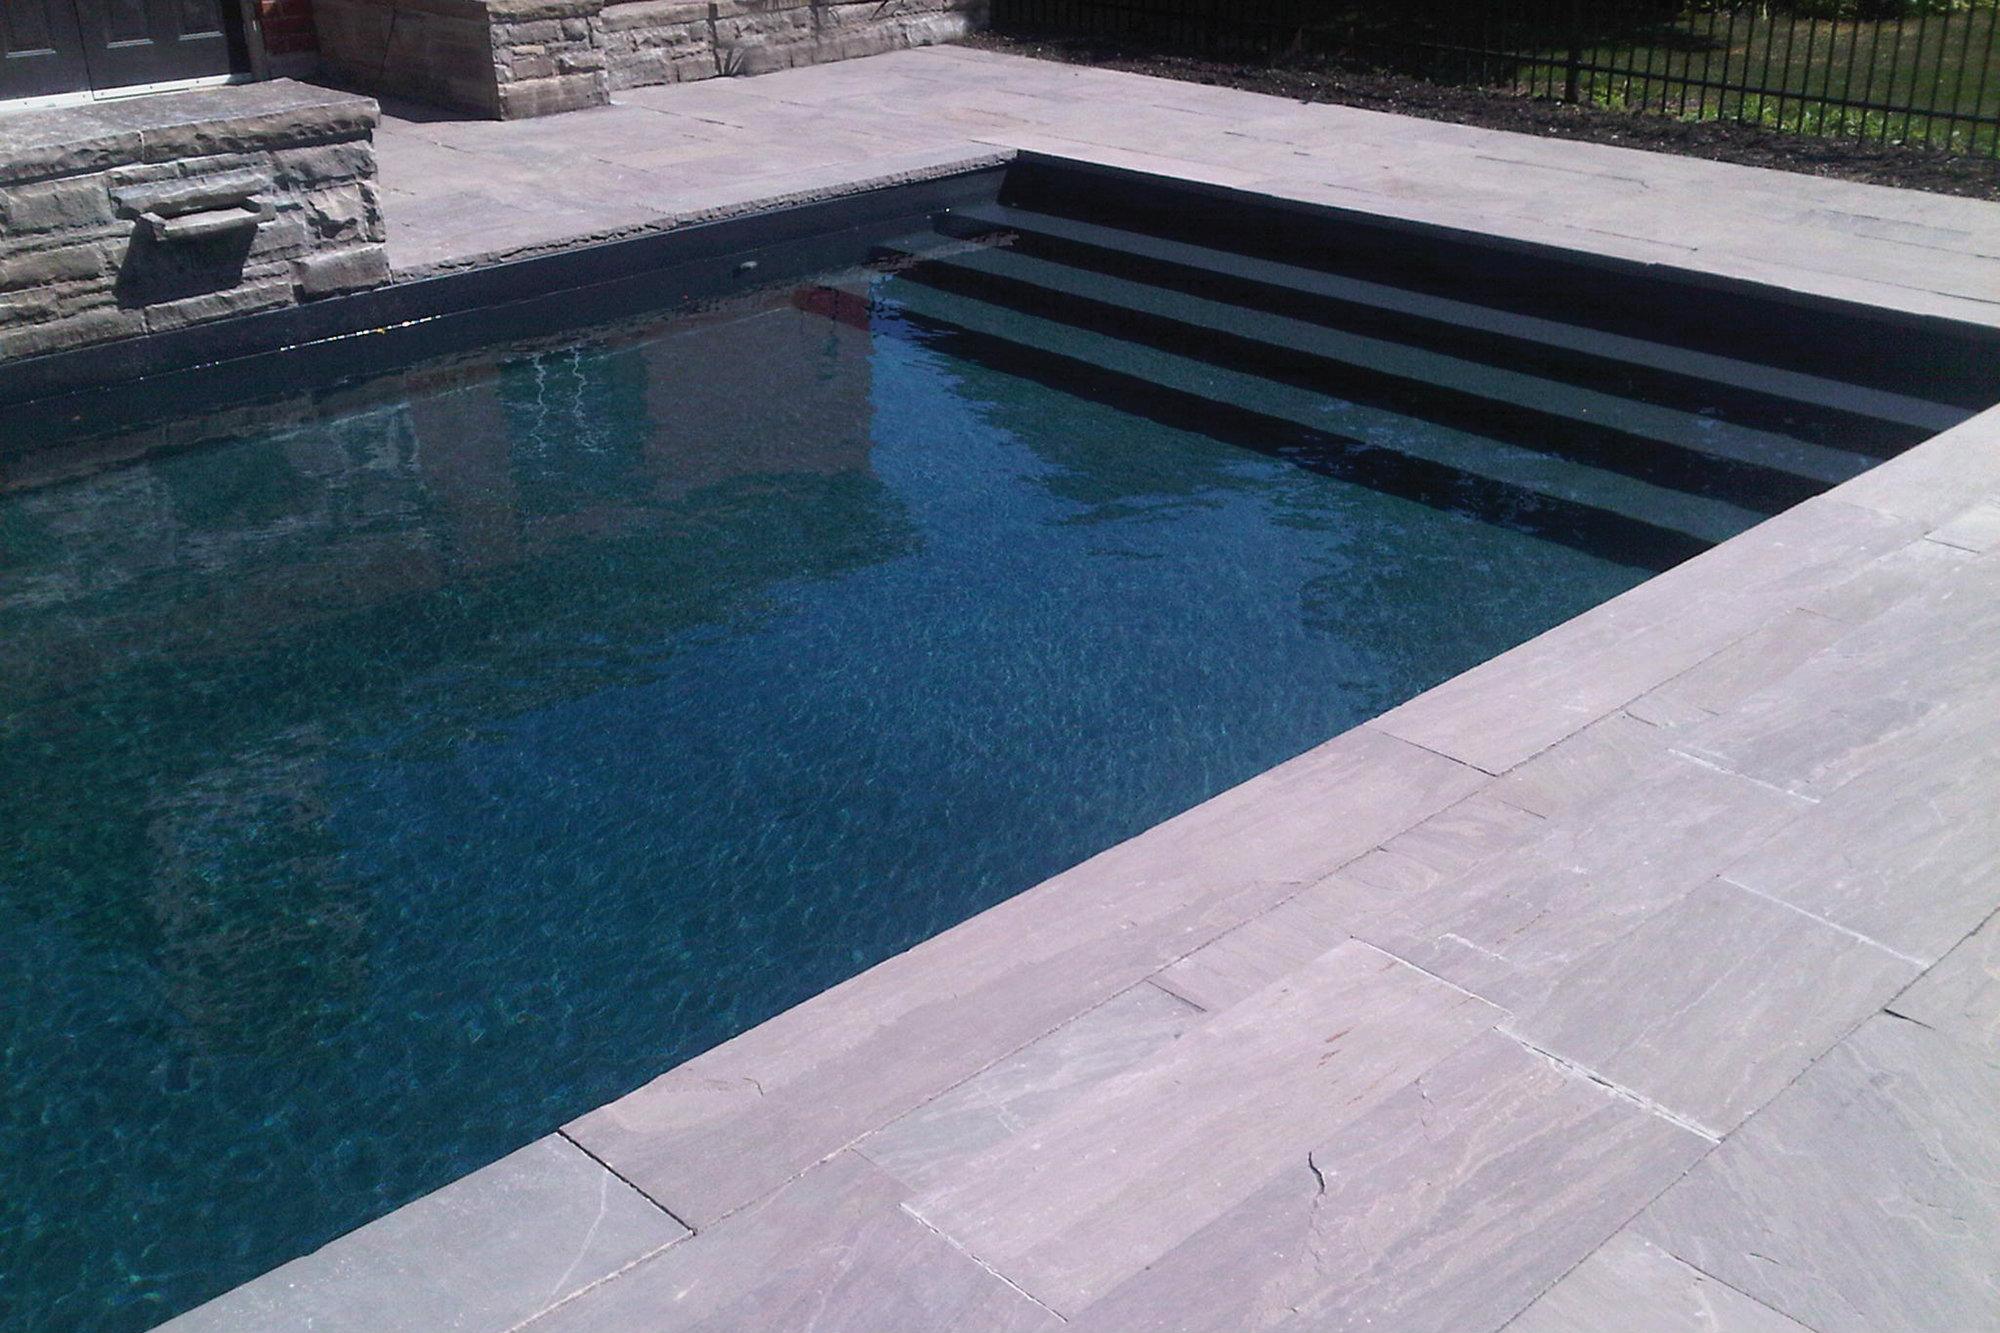 Pen Fabricators Introduces New Black Granite Inground Vinyl Pool Liner Pool Spa News